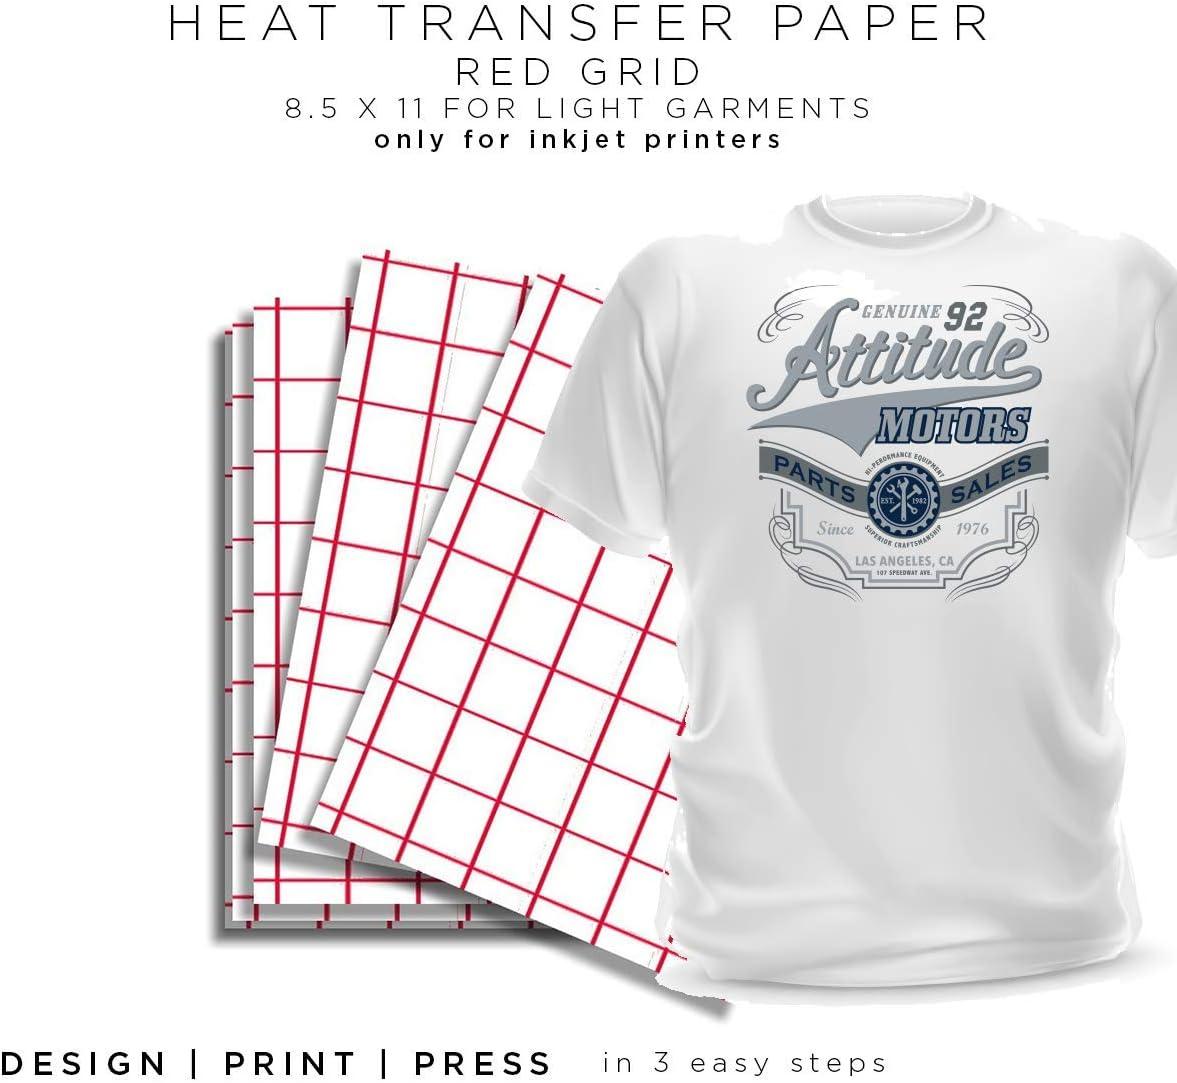 HEAT TRANSFER PAPER RED GRID IRON ON LIGHT TSHIRT 100 Sheets 8.5x11